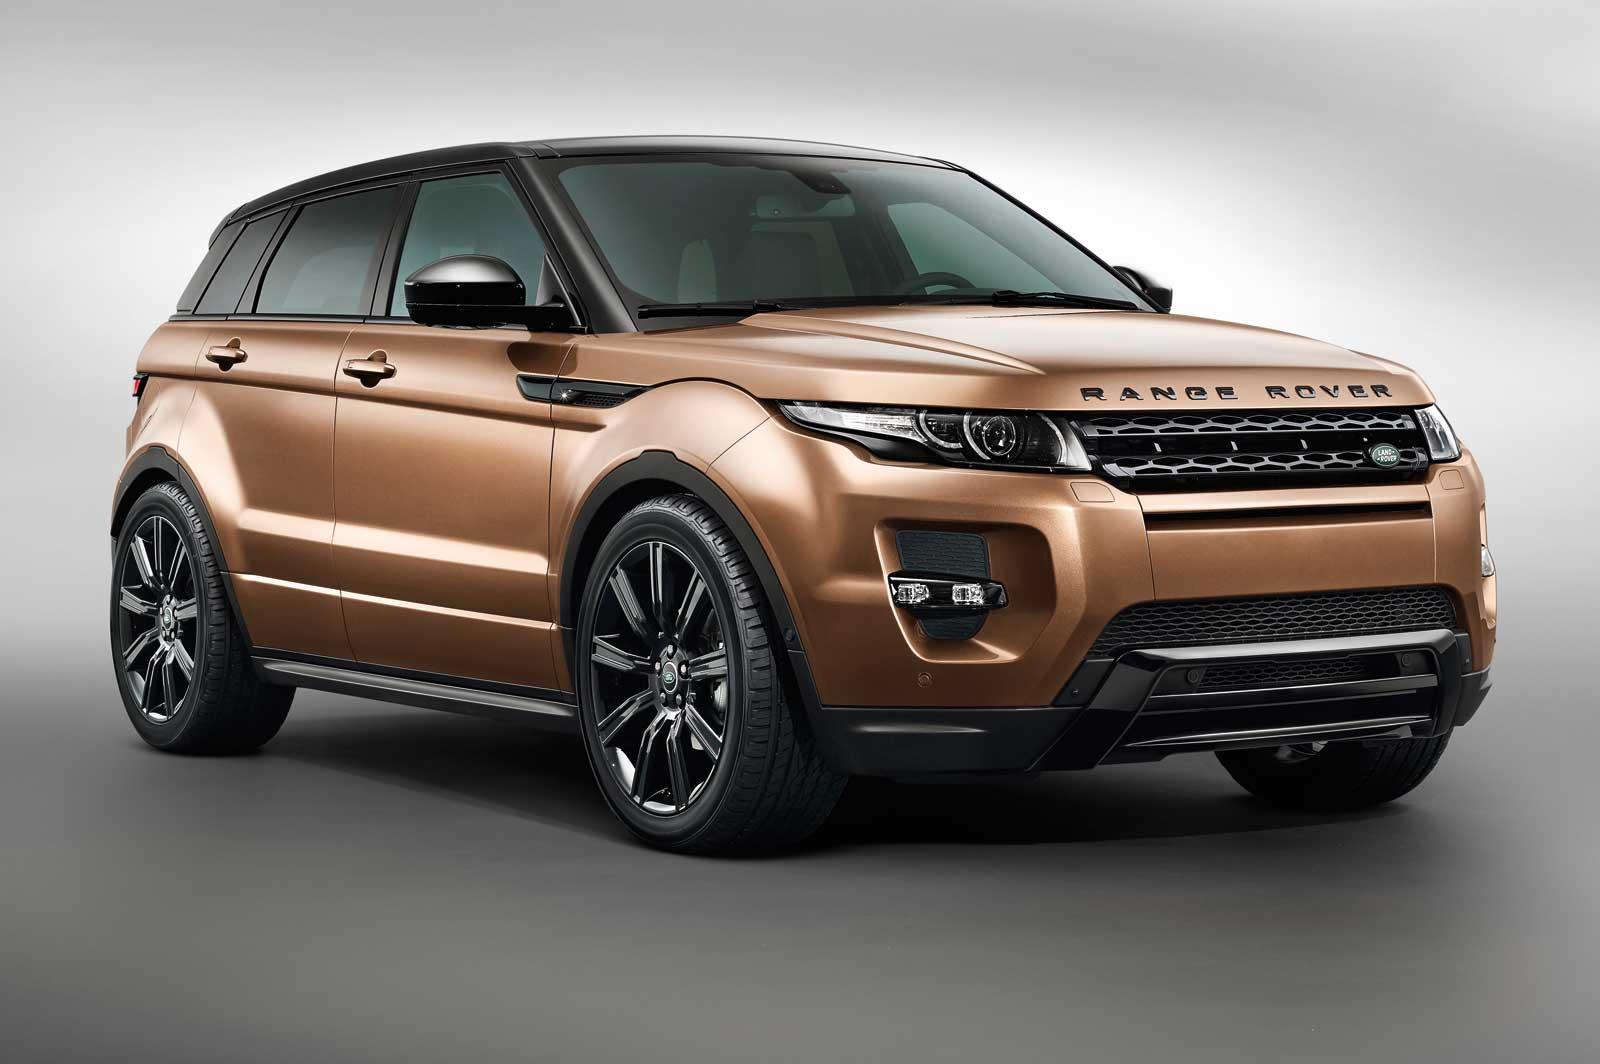 new 2014 range rover evoque photo gallery car gallery premium luxury suvs autocar india. Black Bedroom Furniture Sets. Home Design Ideas